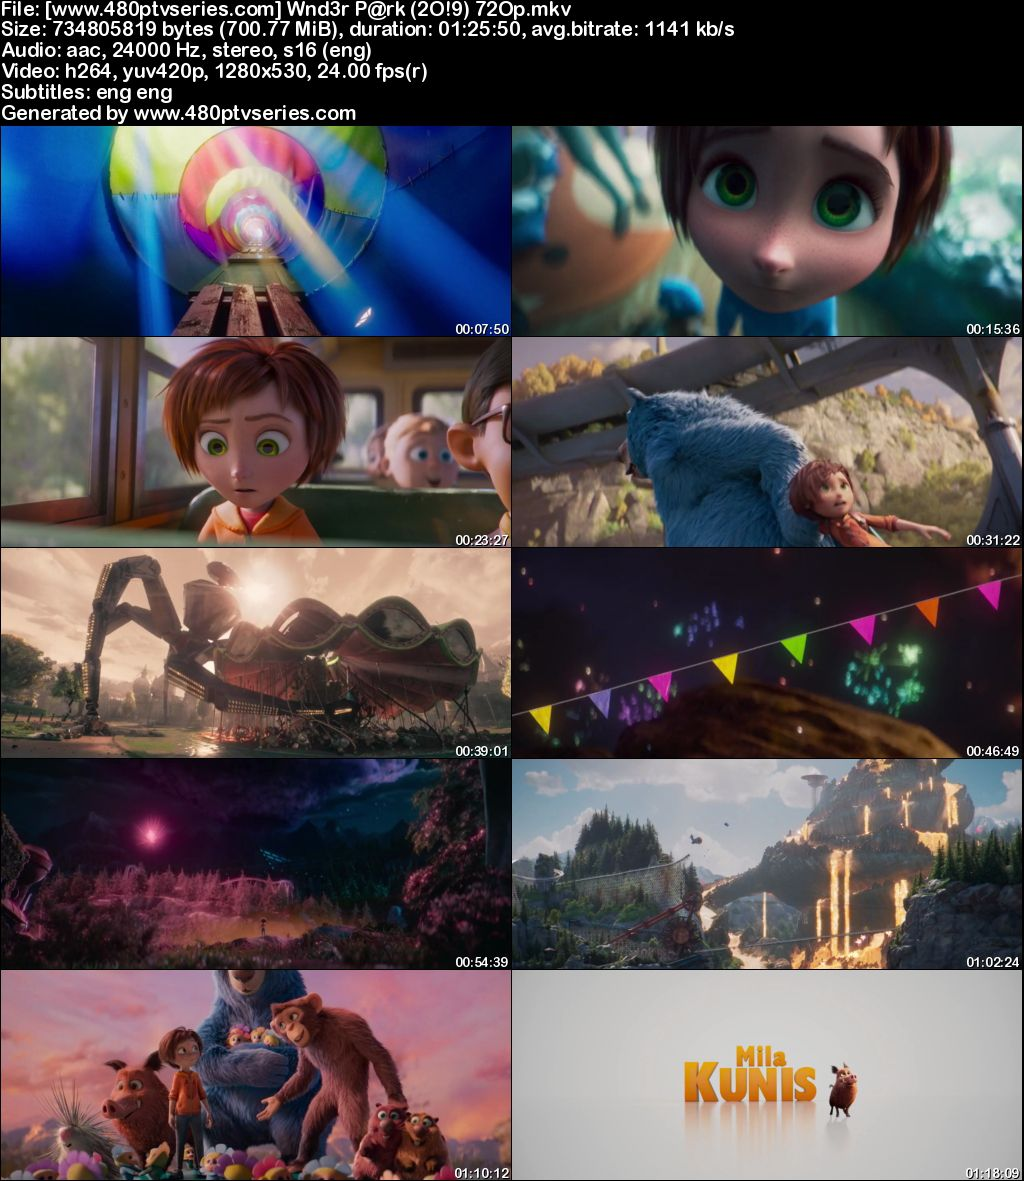 Watch Online Free Wonder Park (2019) Full Hindi Dual Audio Movie Download 480p 720p Bluray